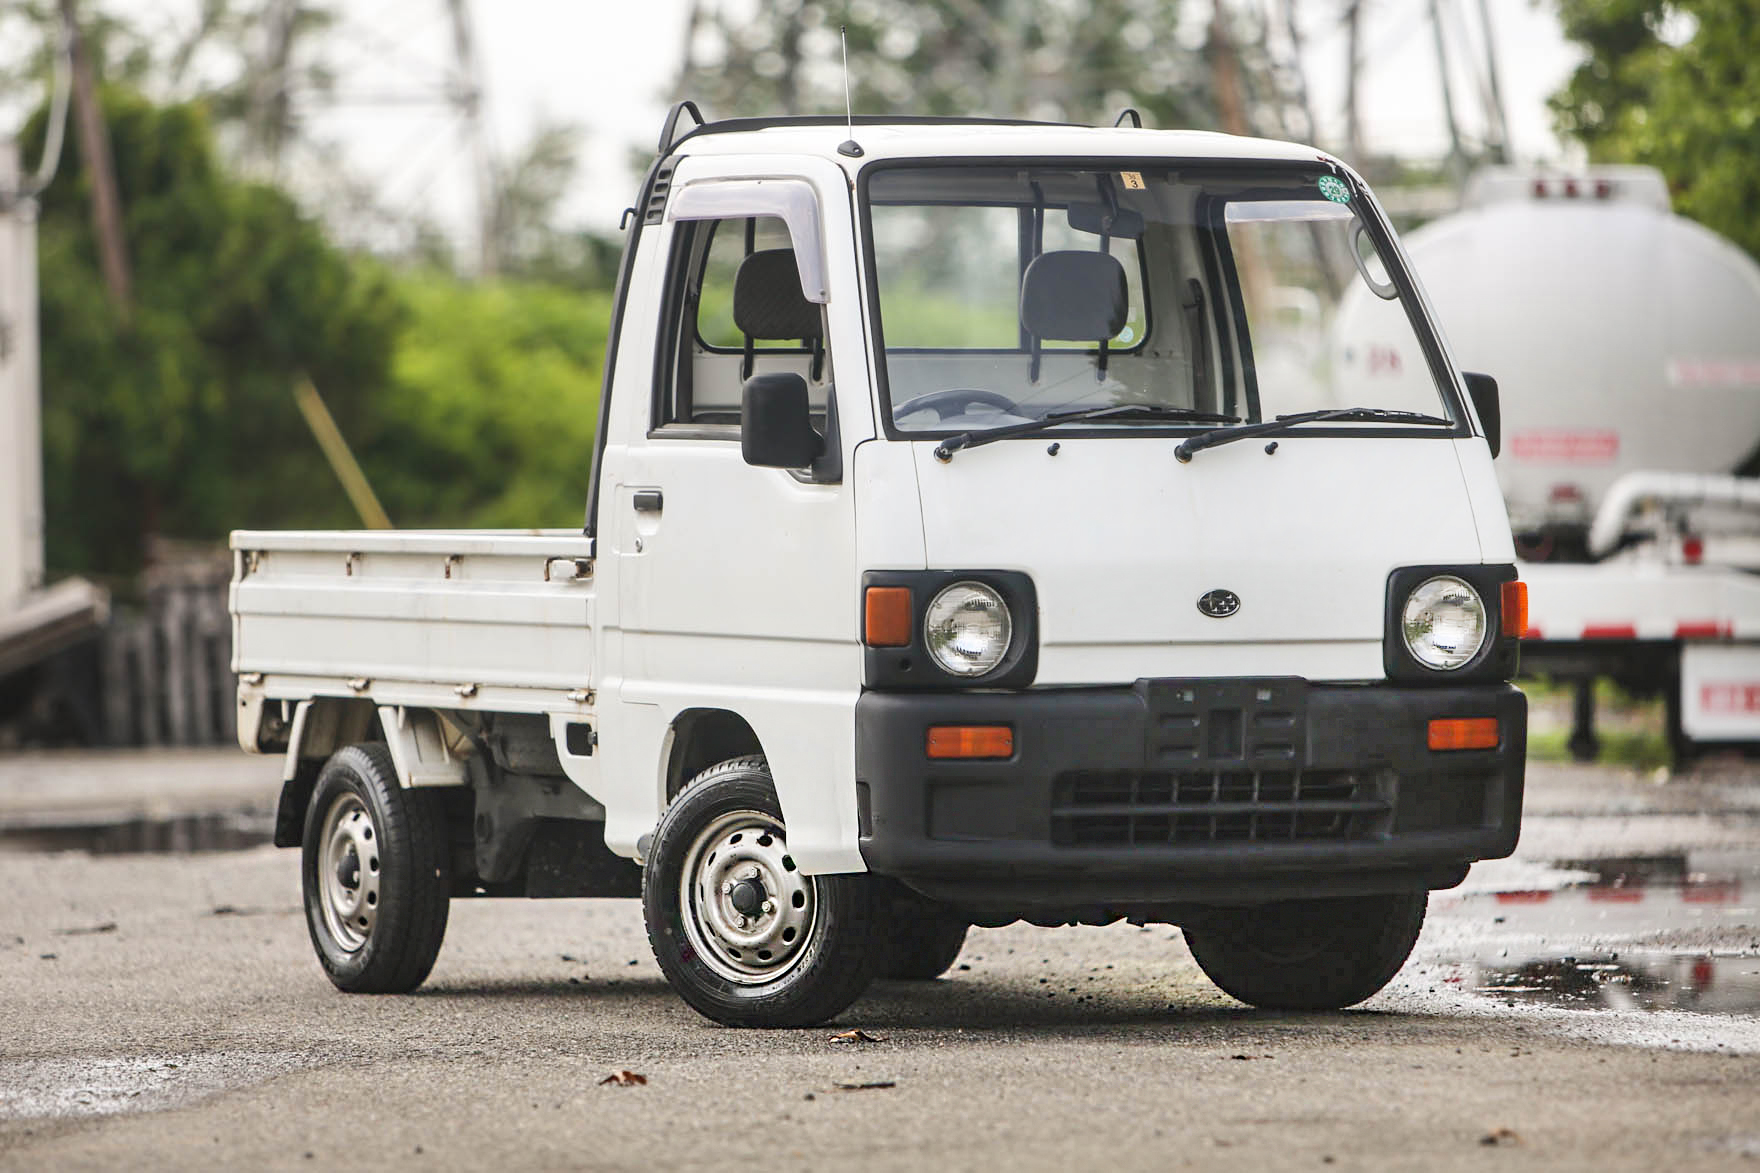 1992 Subaru Sambar 2WD - $4,150